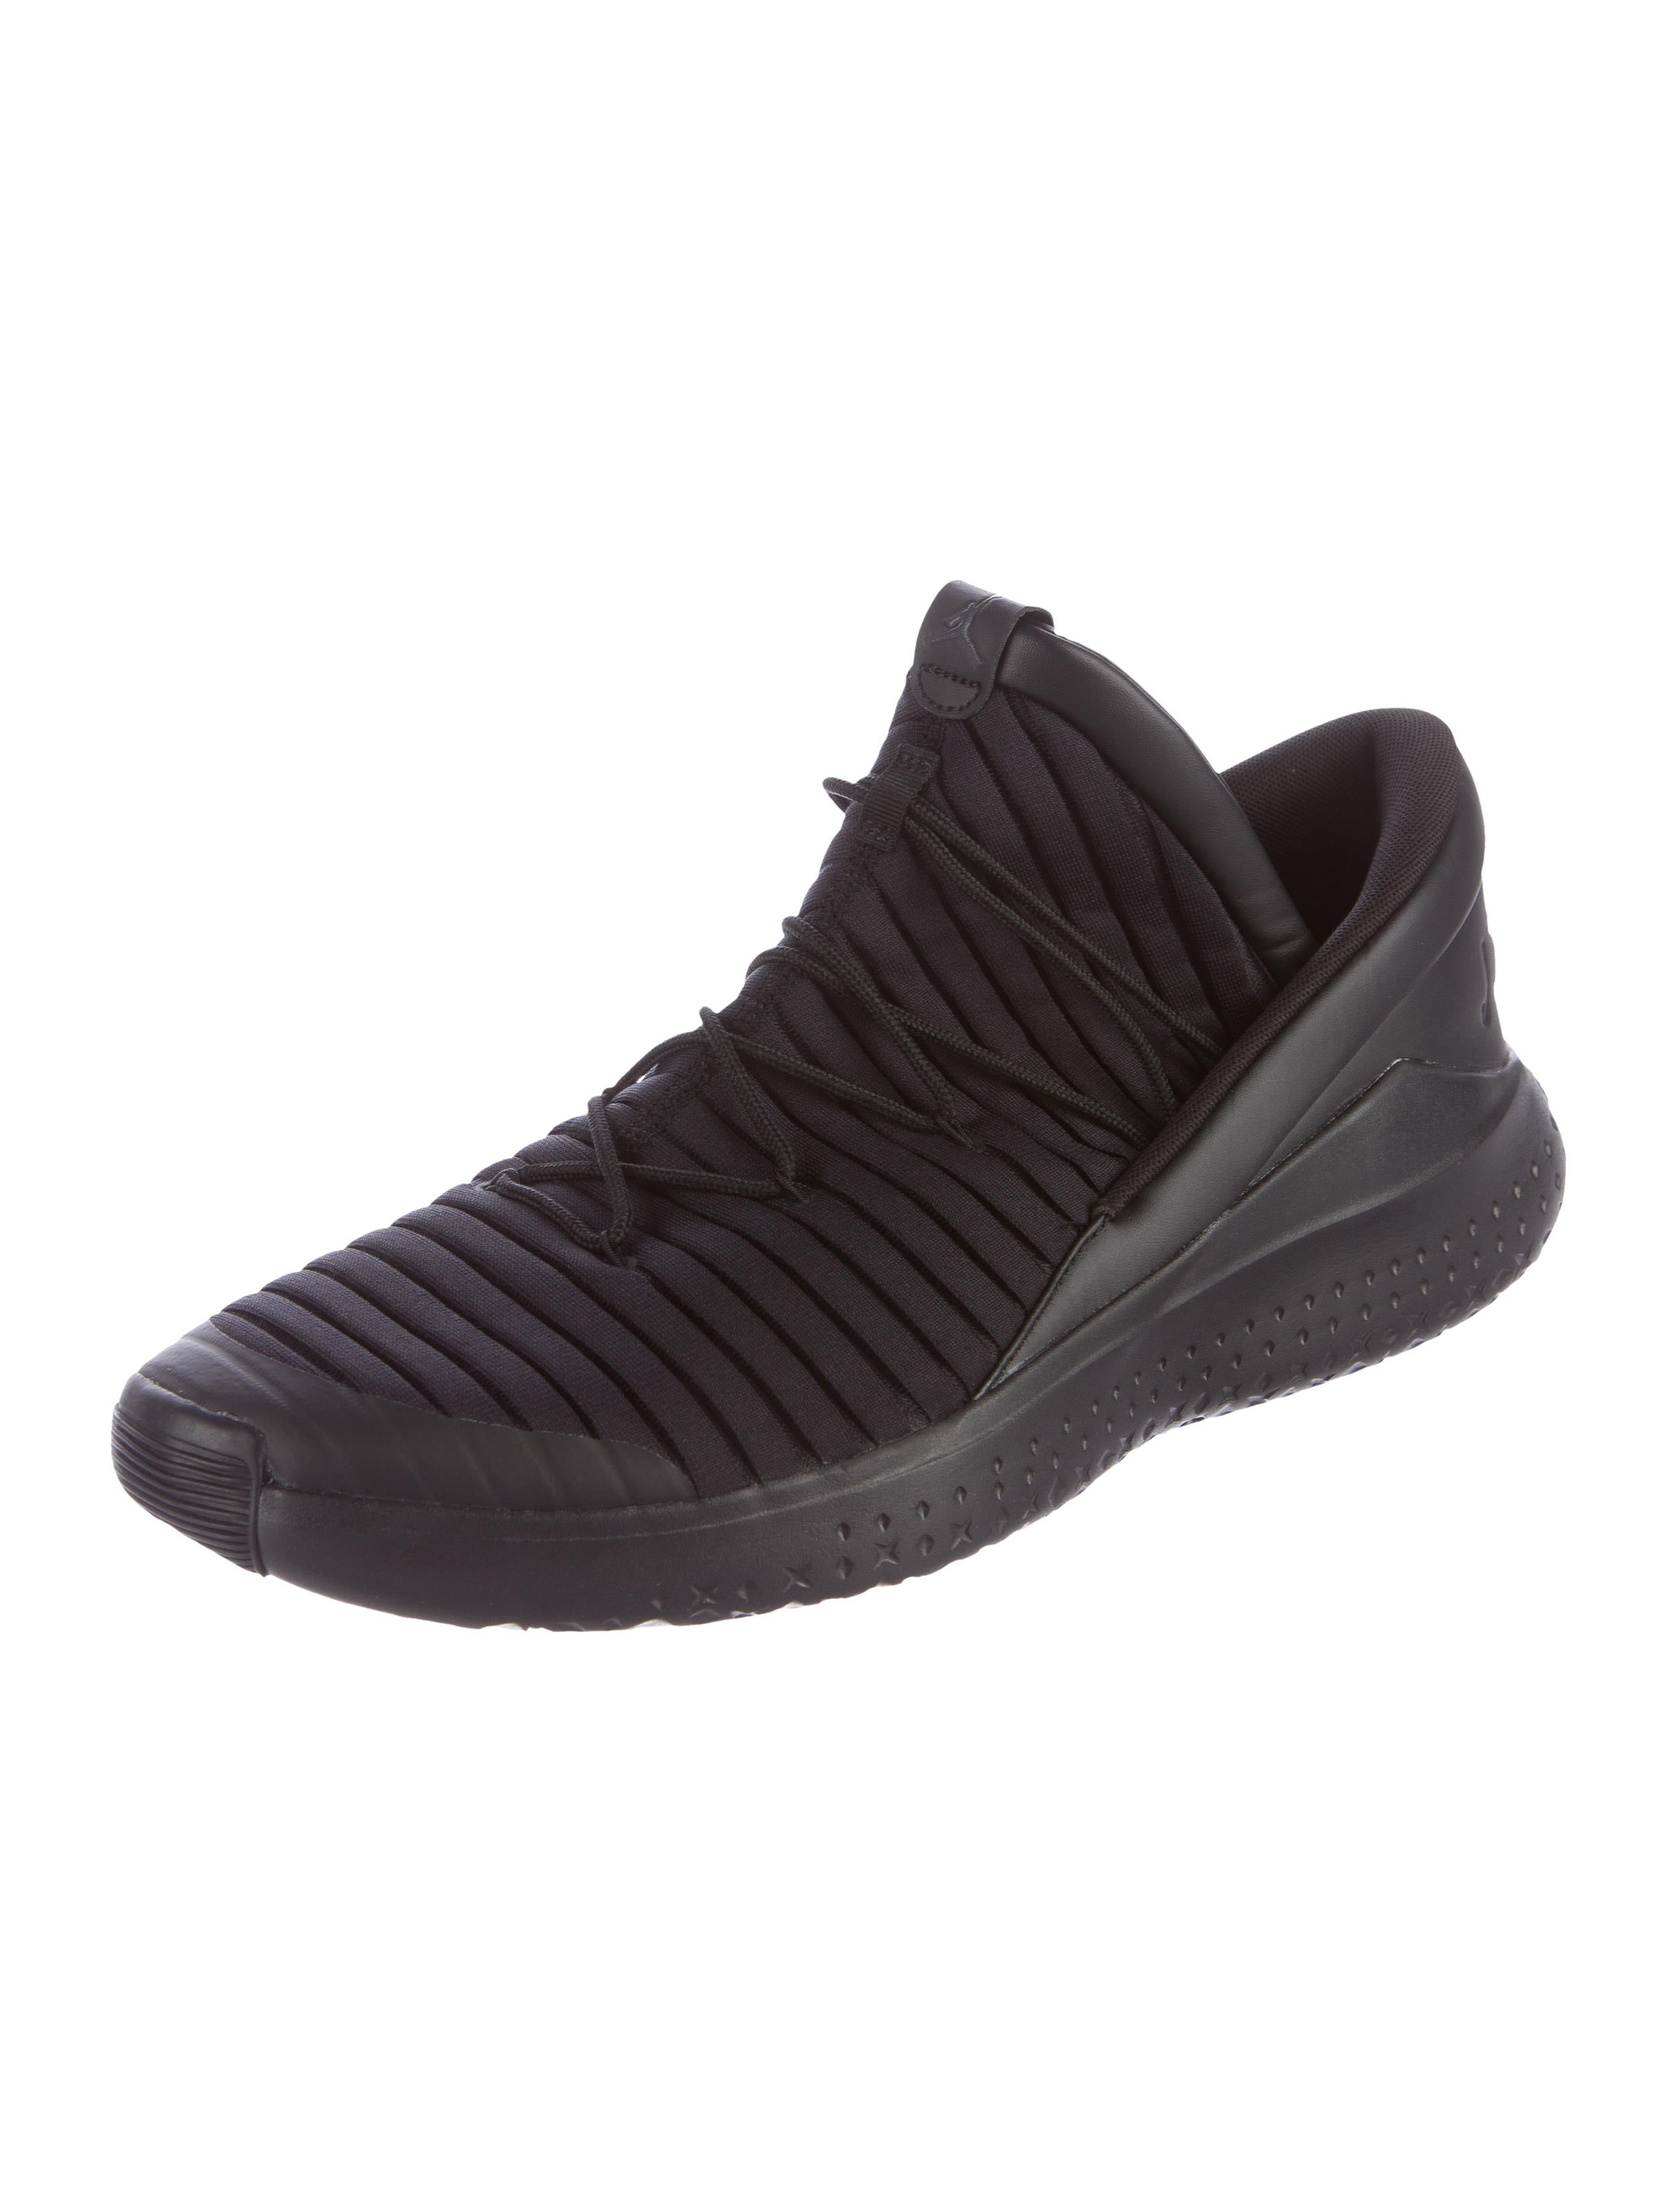 ... Dunk High Ac Canvas Obsidian. Nike Zoom Kobe 7 Shoes. nike woven high  top sneaker 880faf1c5c9d